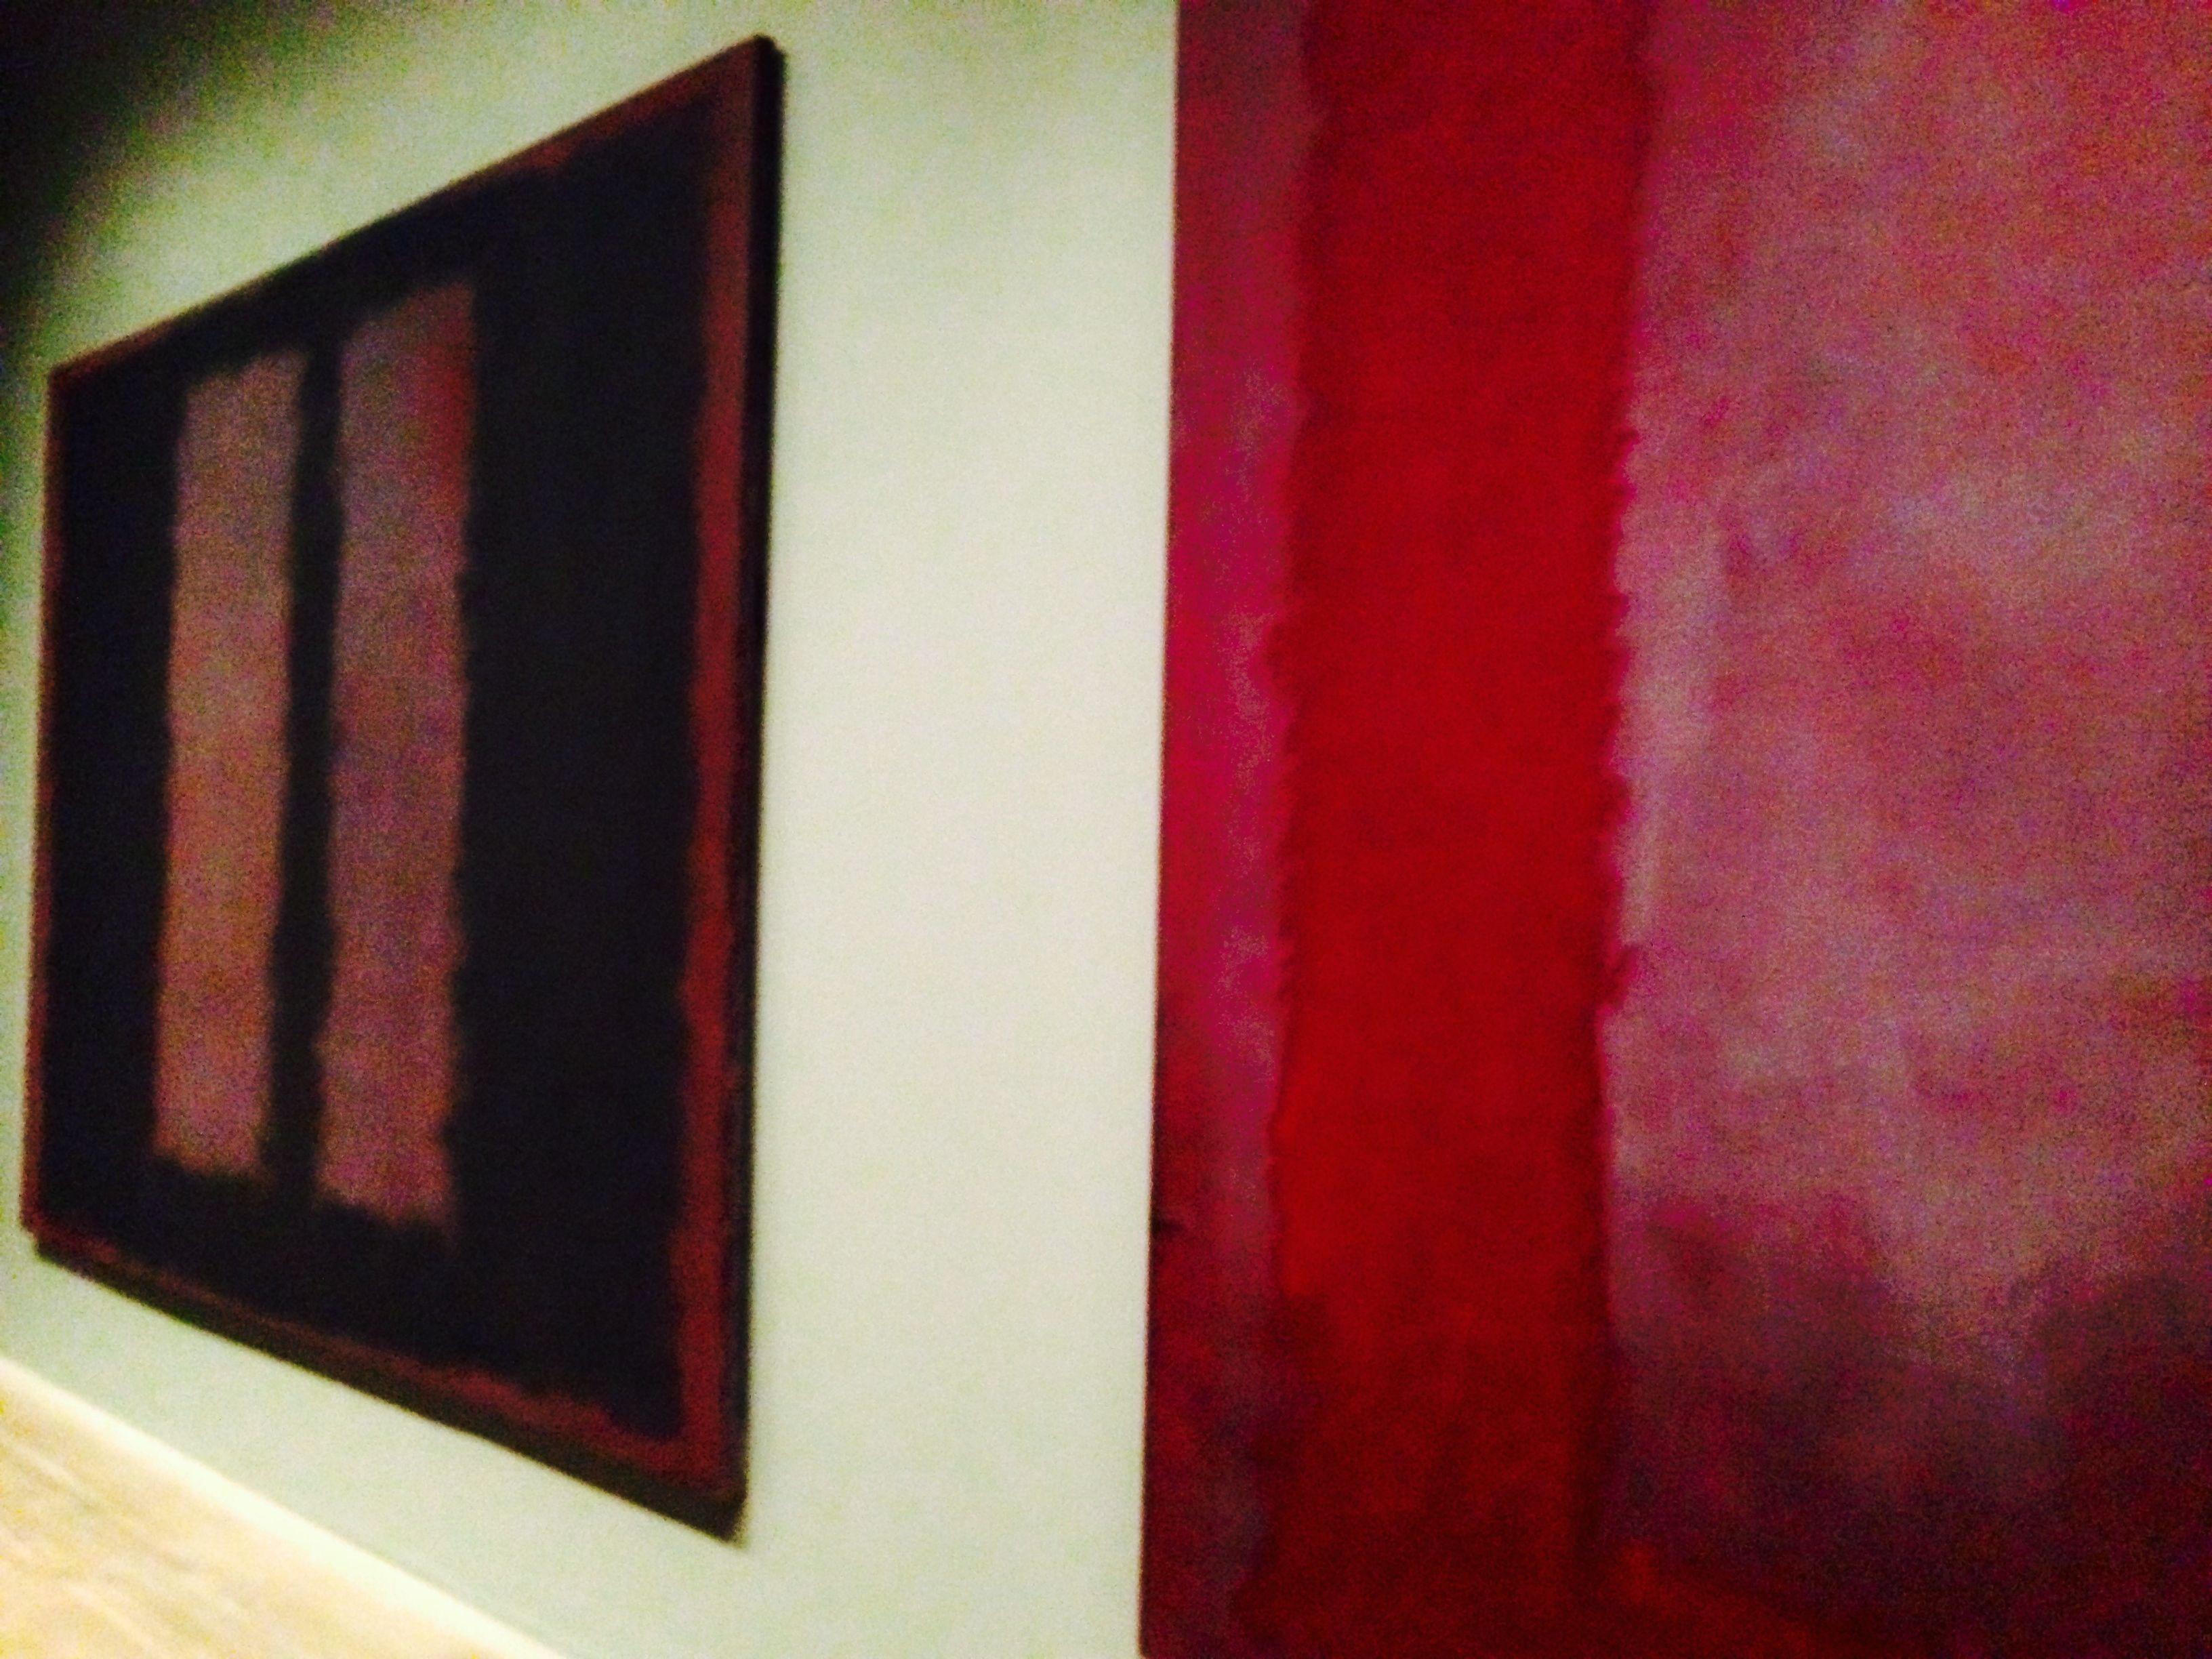 KINSA in London   Rothko Room at the Tate Modern. KINSA in London   Rothko Room at the Tate Modern   KINSA in London